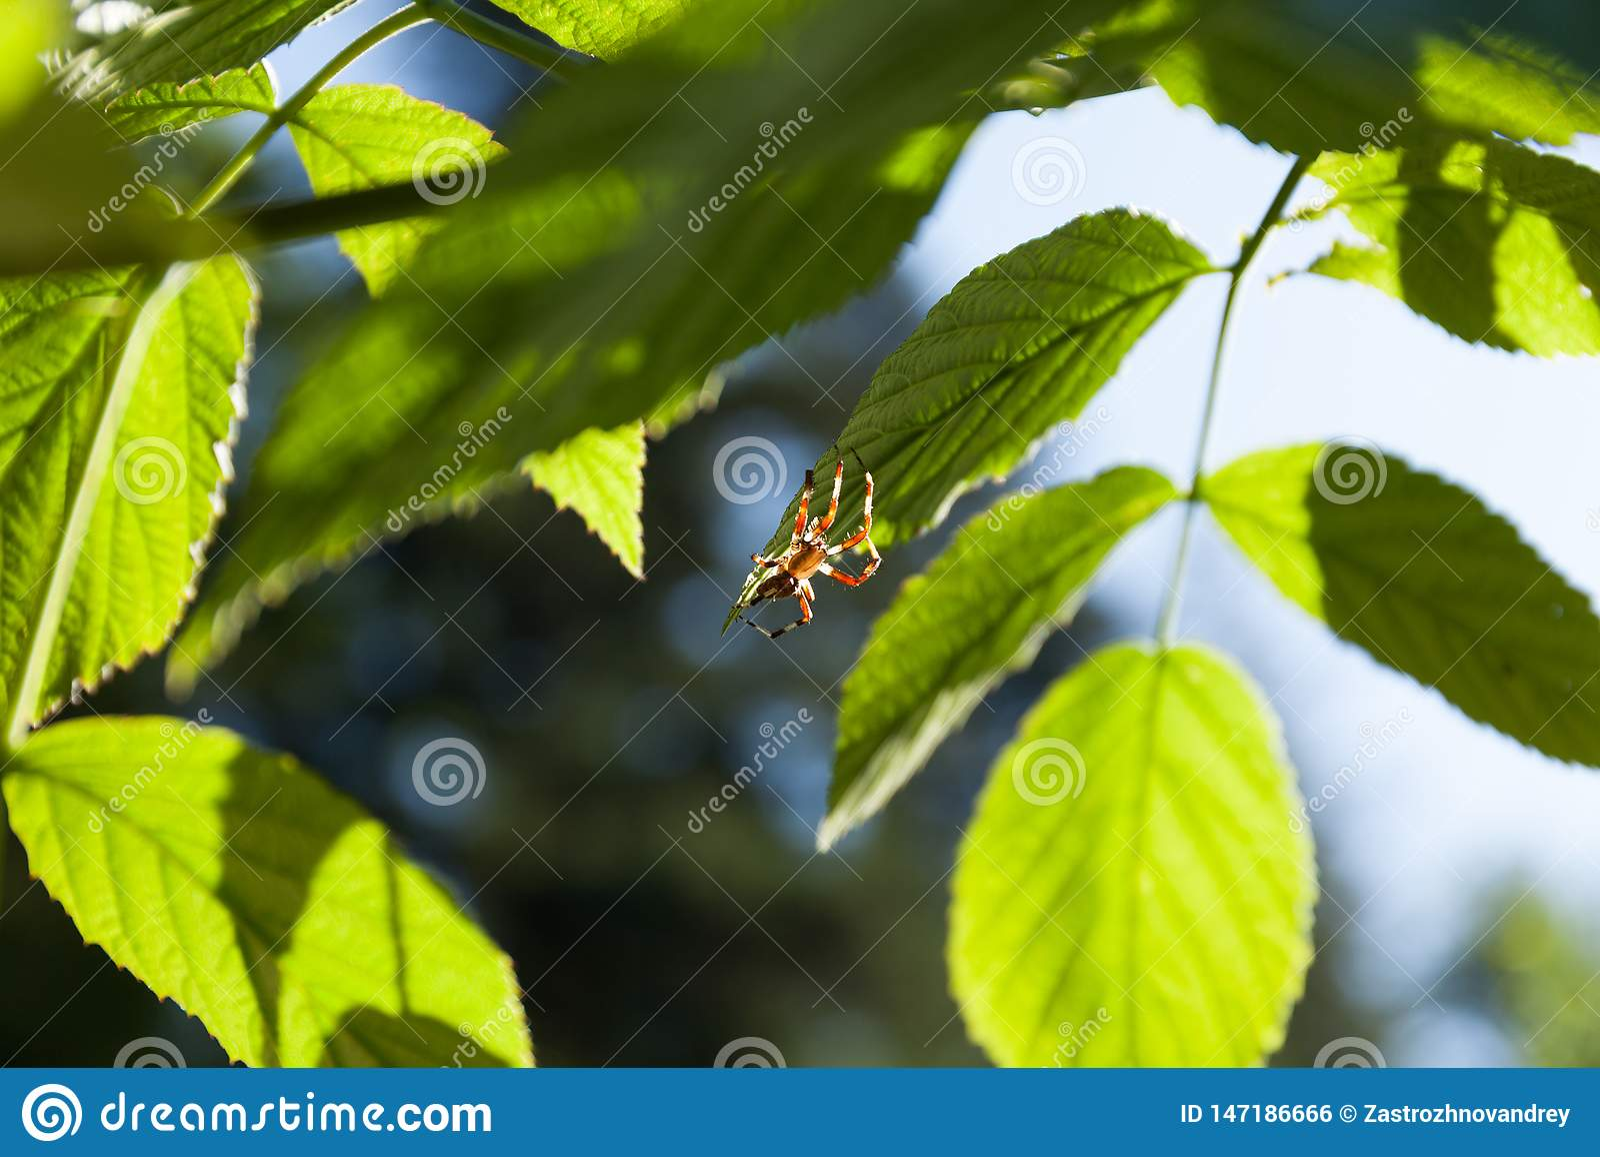 Ragno in foglie, macro Aracnide animale